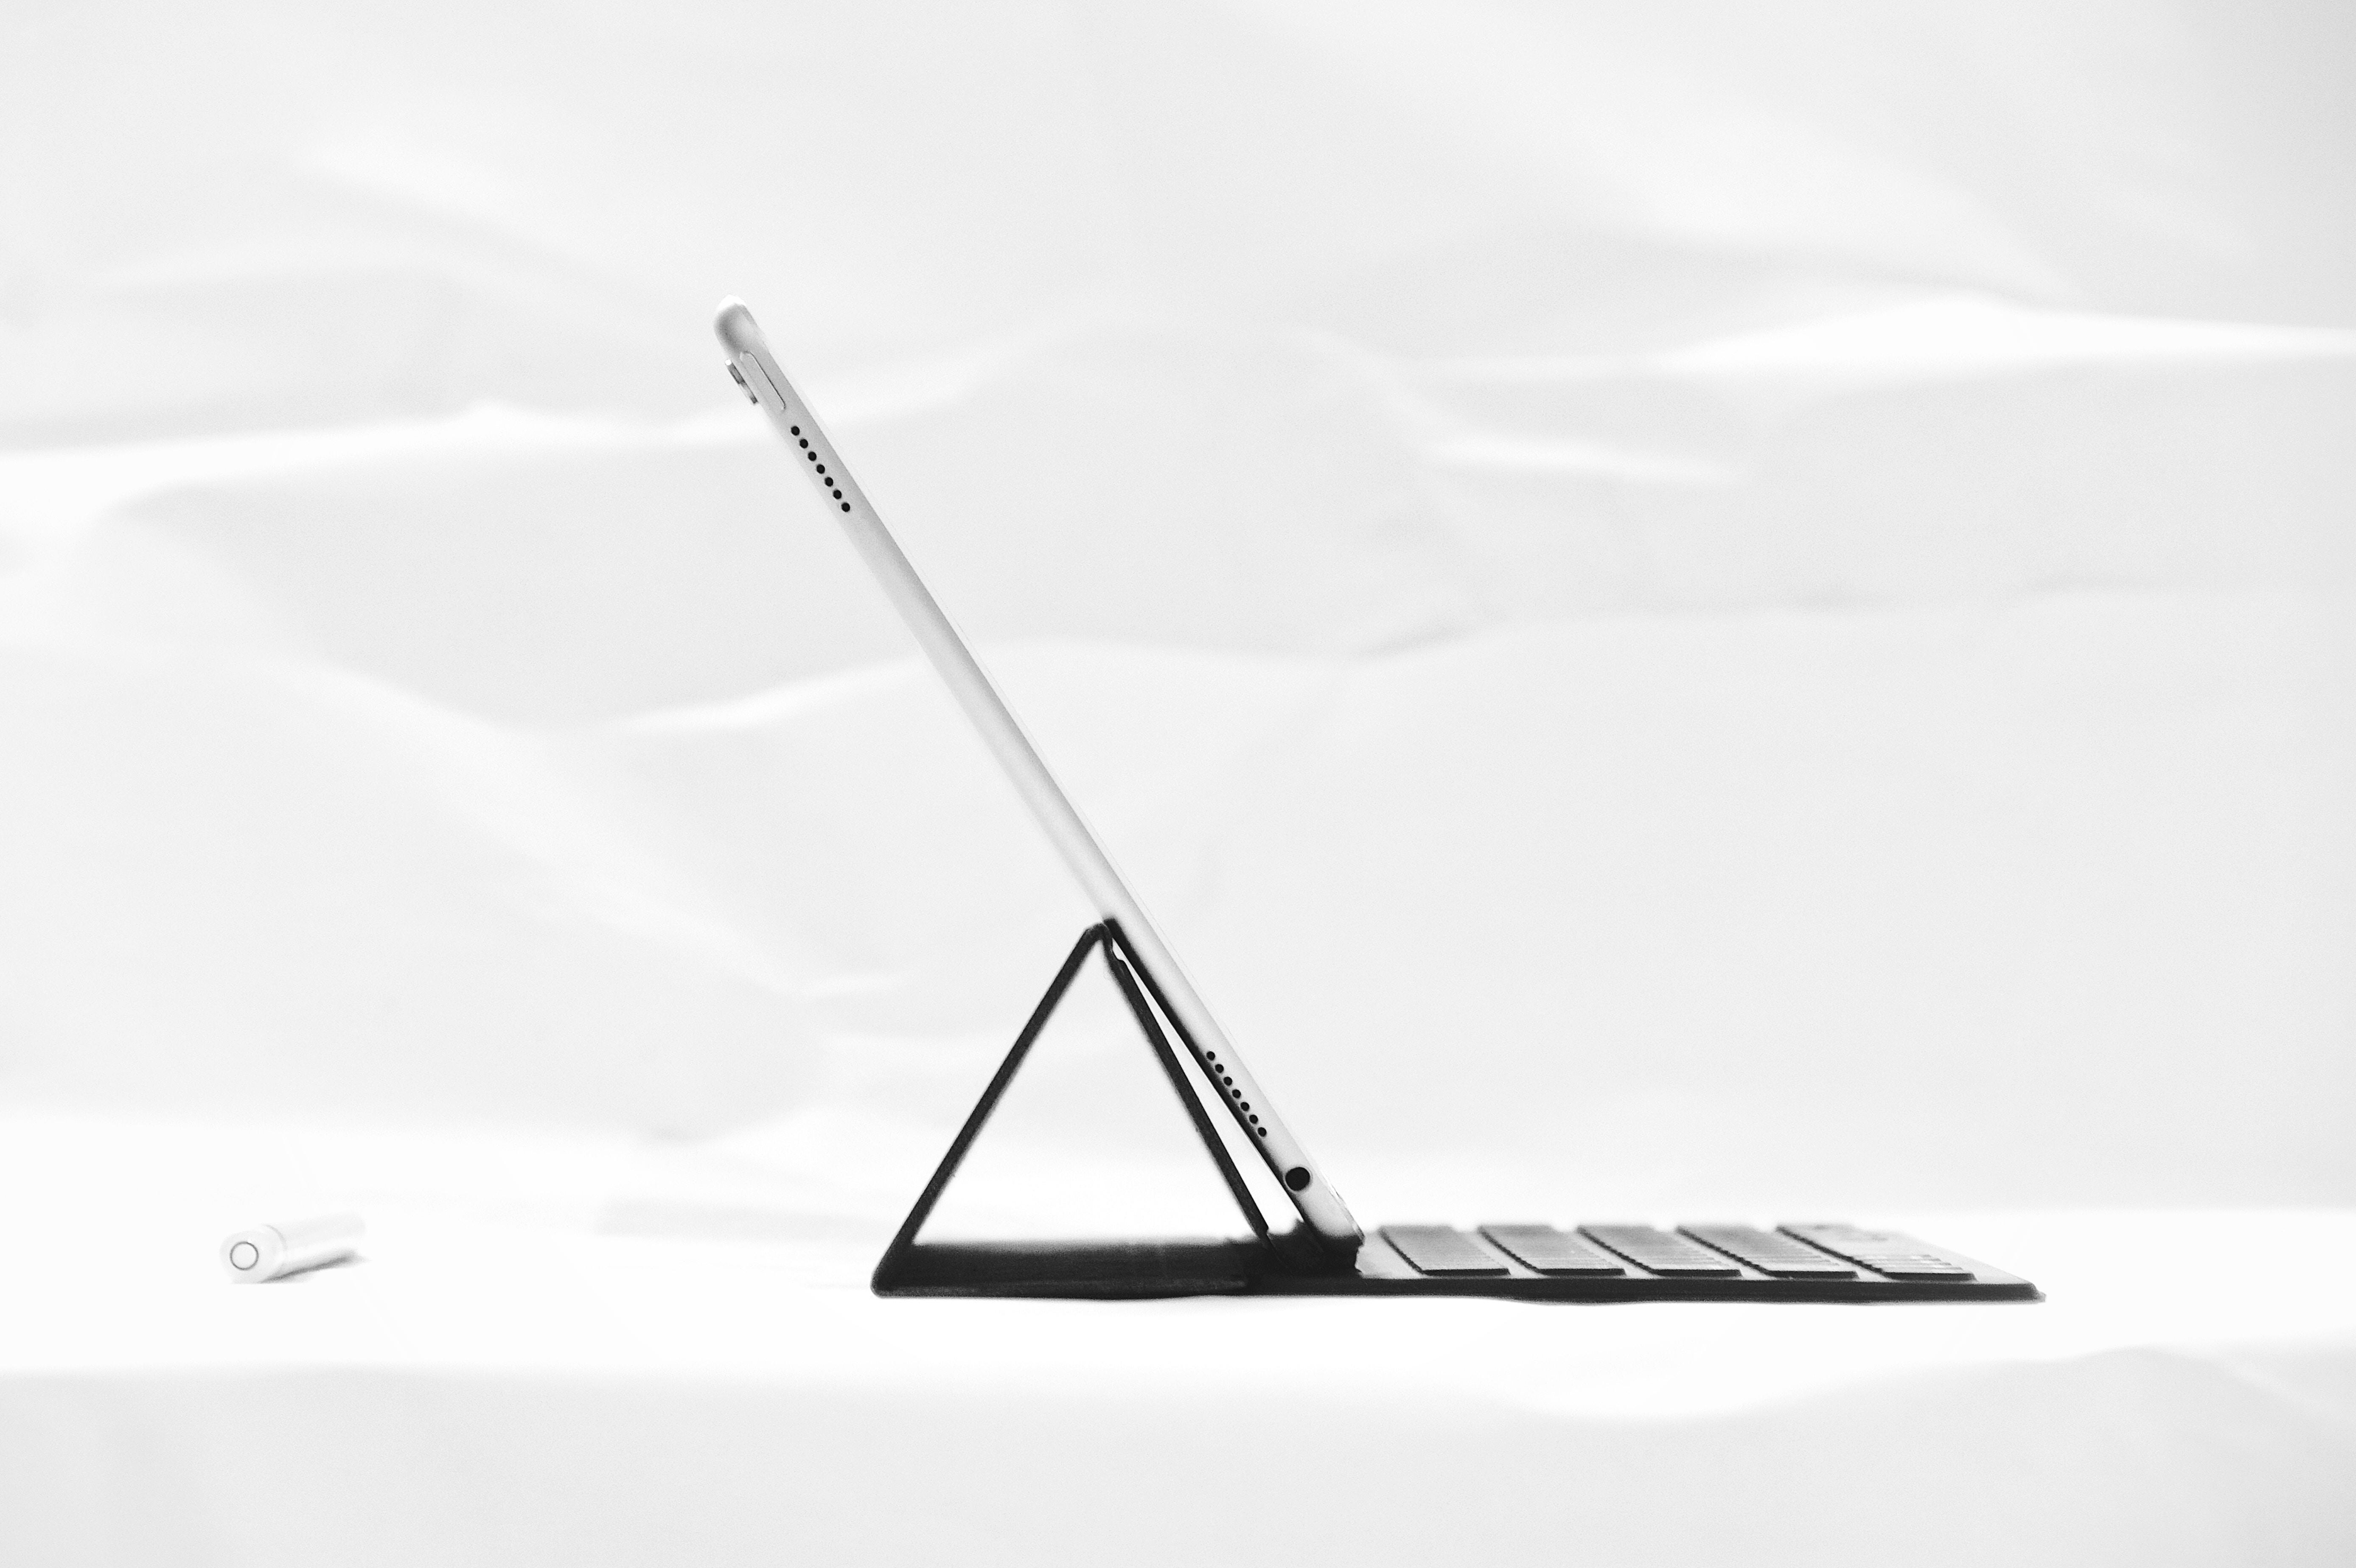 silver iPad on black dock keyboard